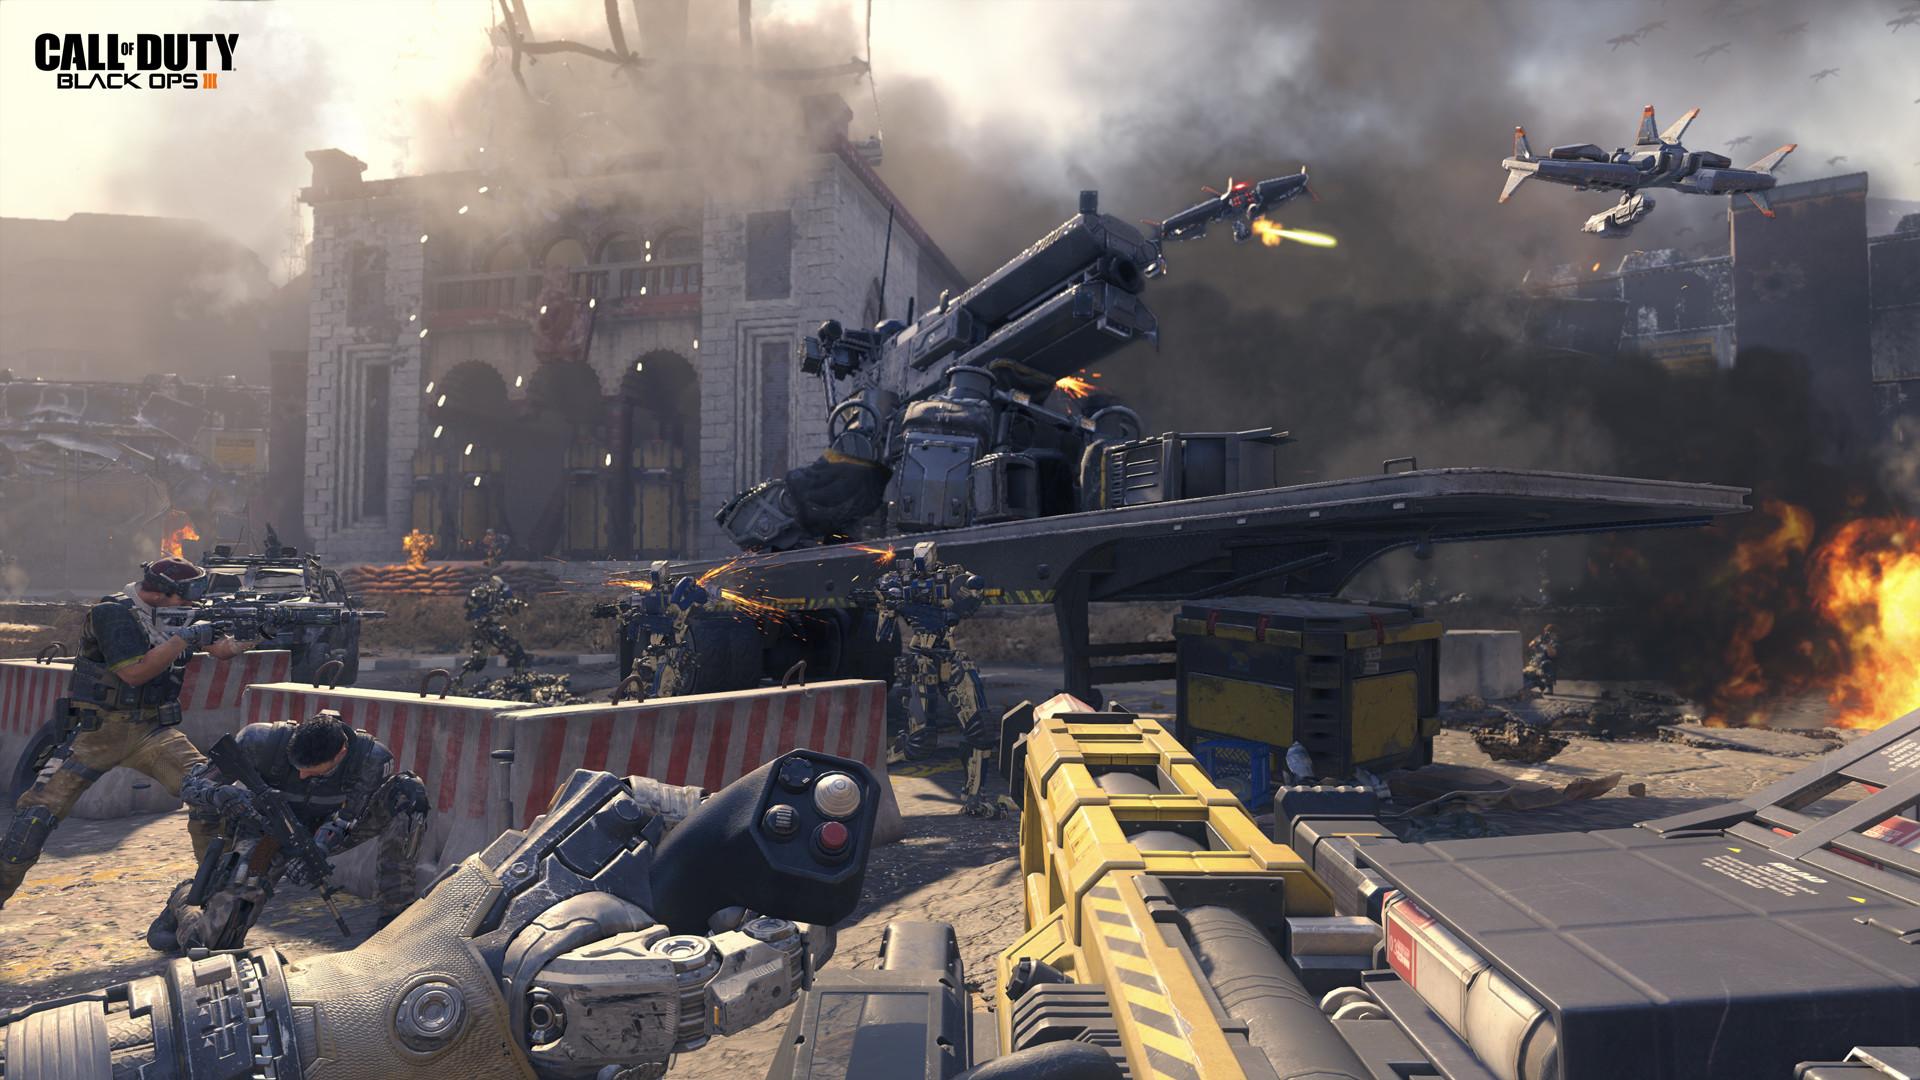 Call of Duty: Black Ops III · AppID: 311210